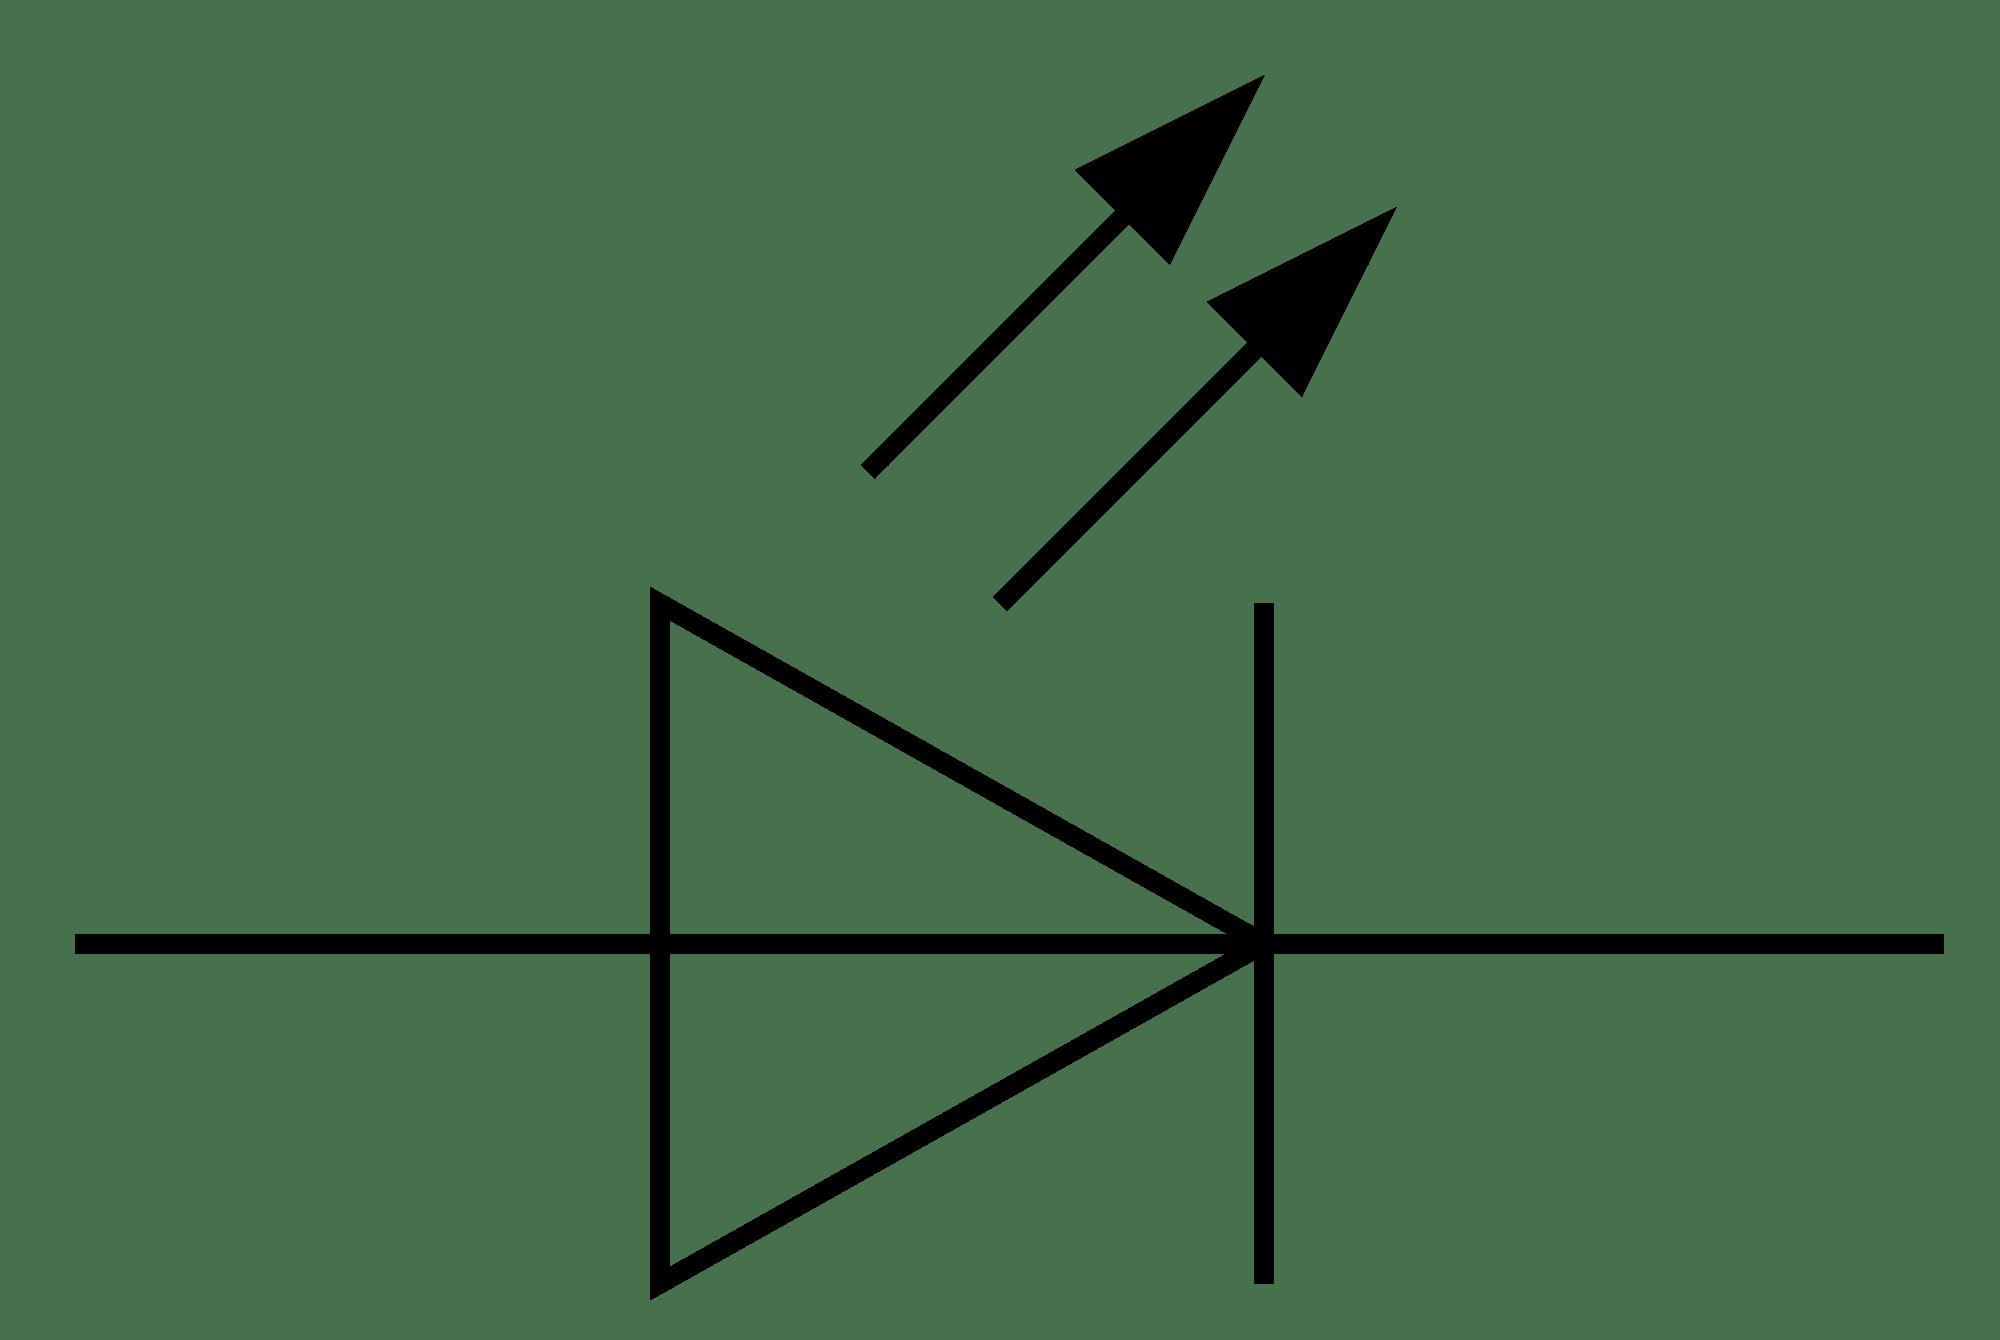 electrical circuit symbol 86